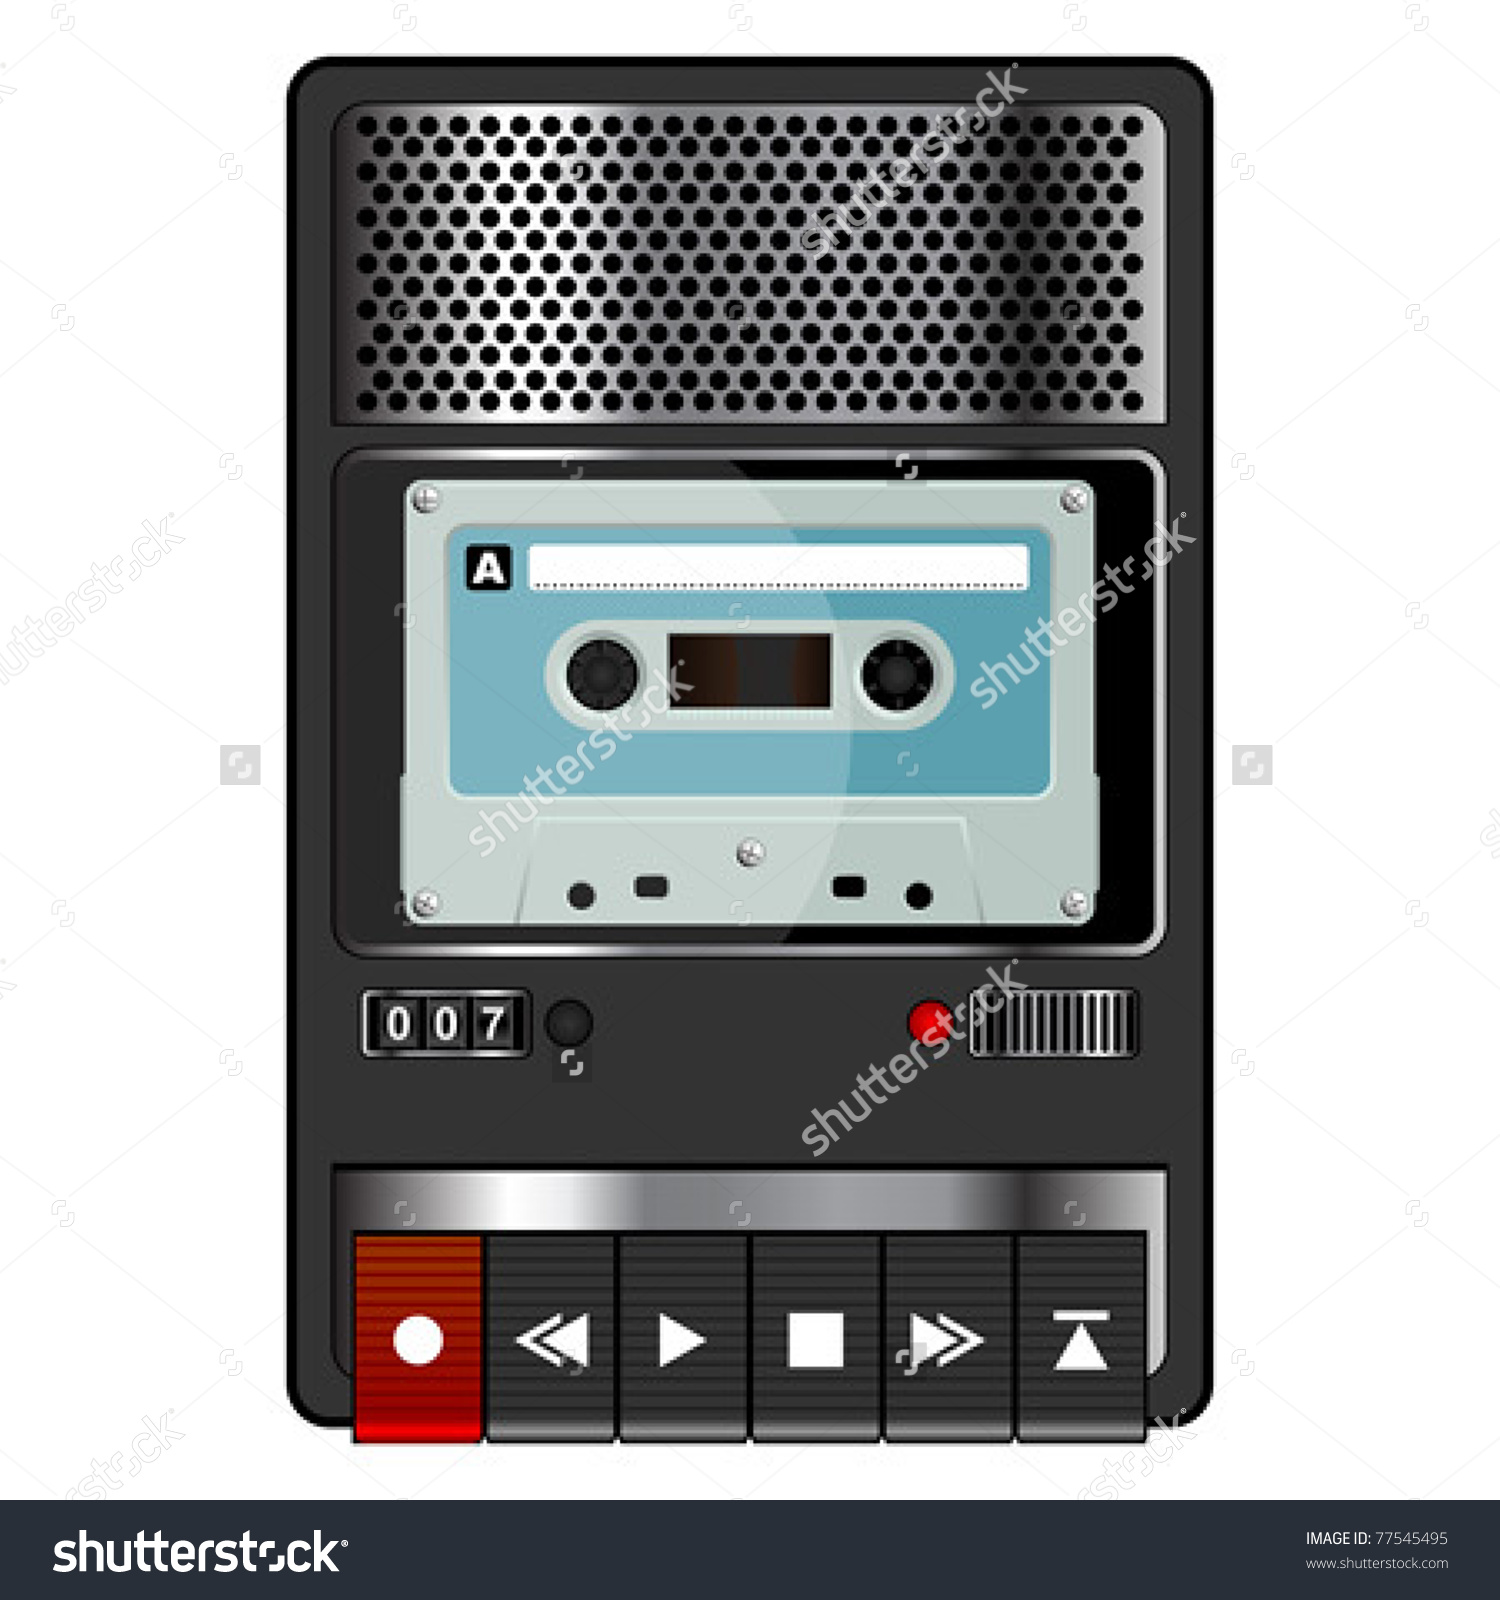 Old Tape Recorder Stock Vectors & Vector Clip Art.